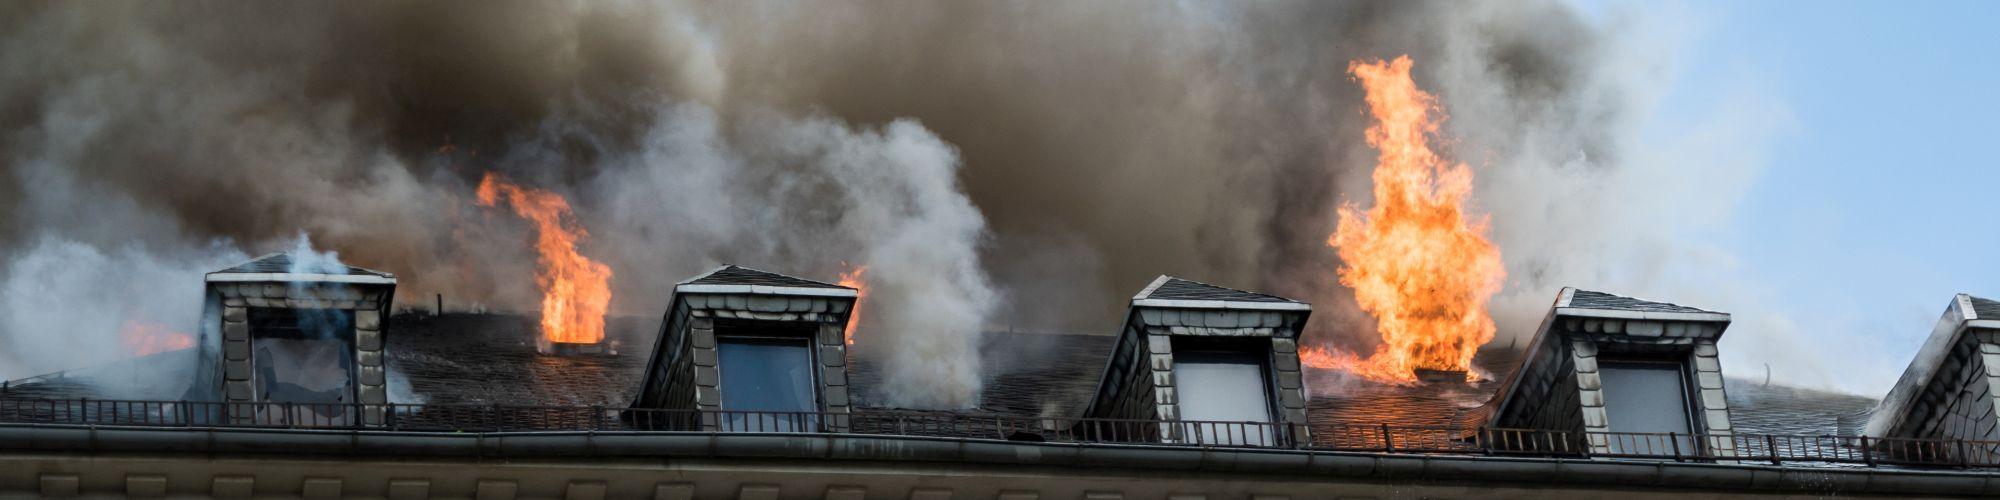 Brandschadstoffuntersuchungen